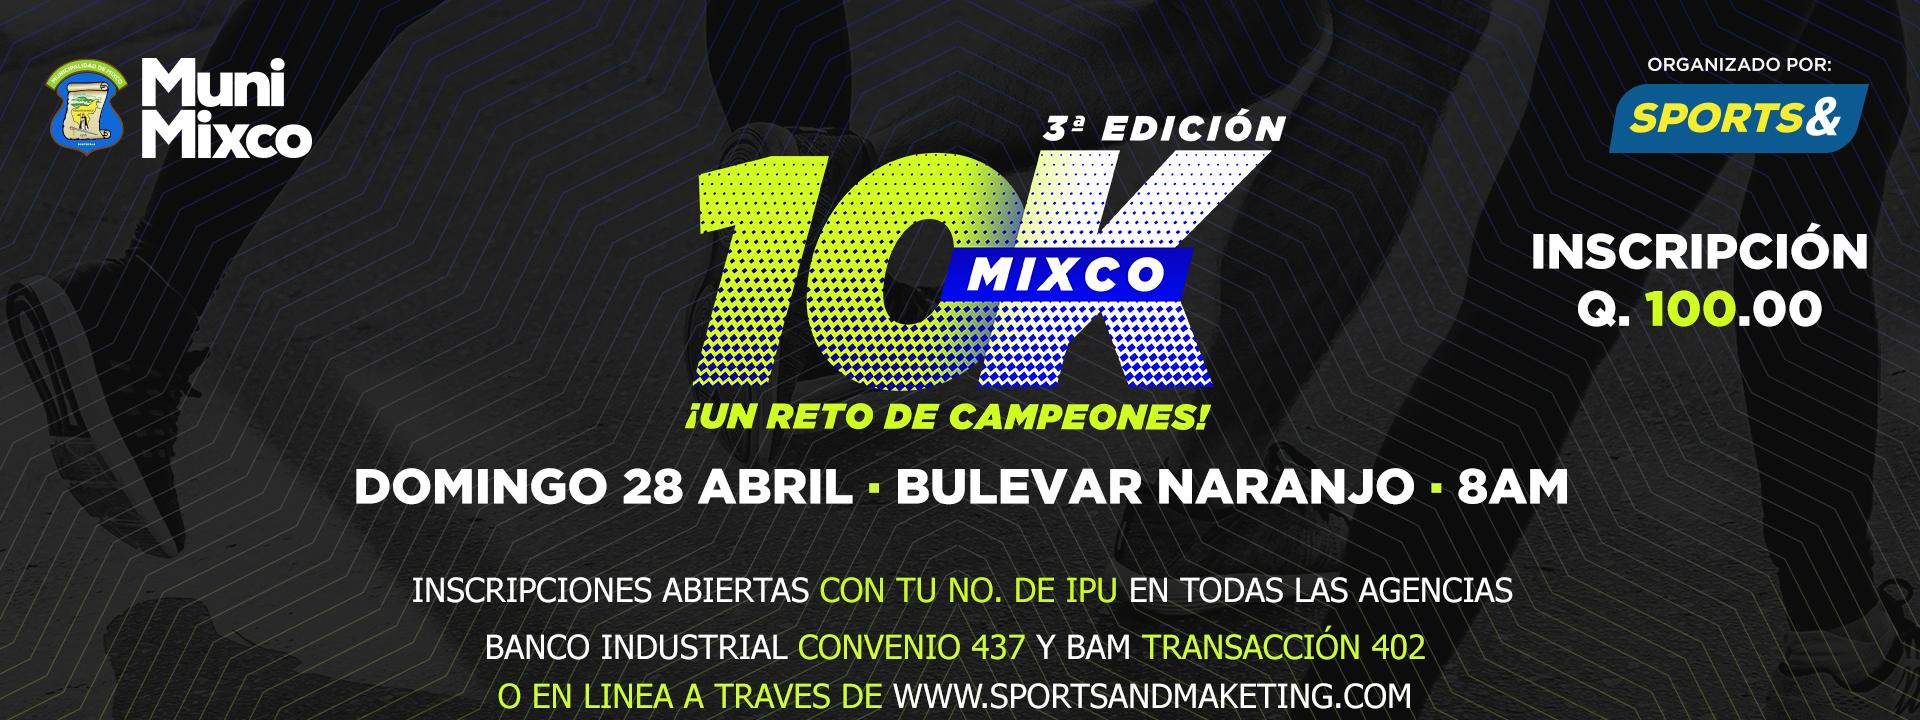 10K Mixco 2019